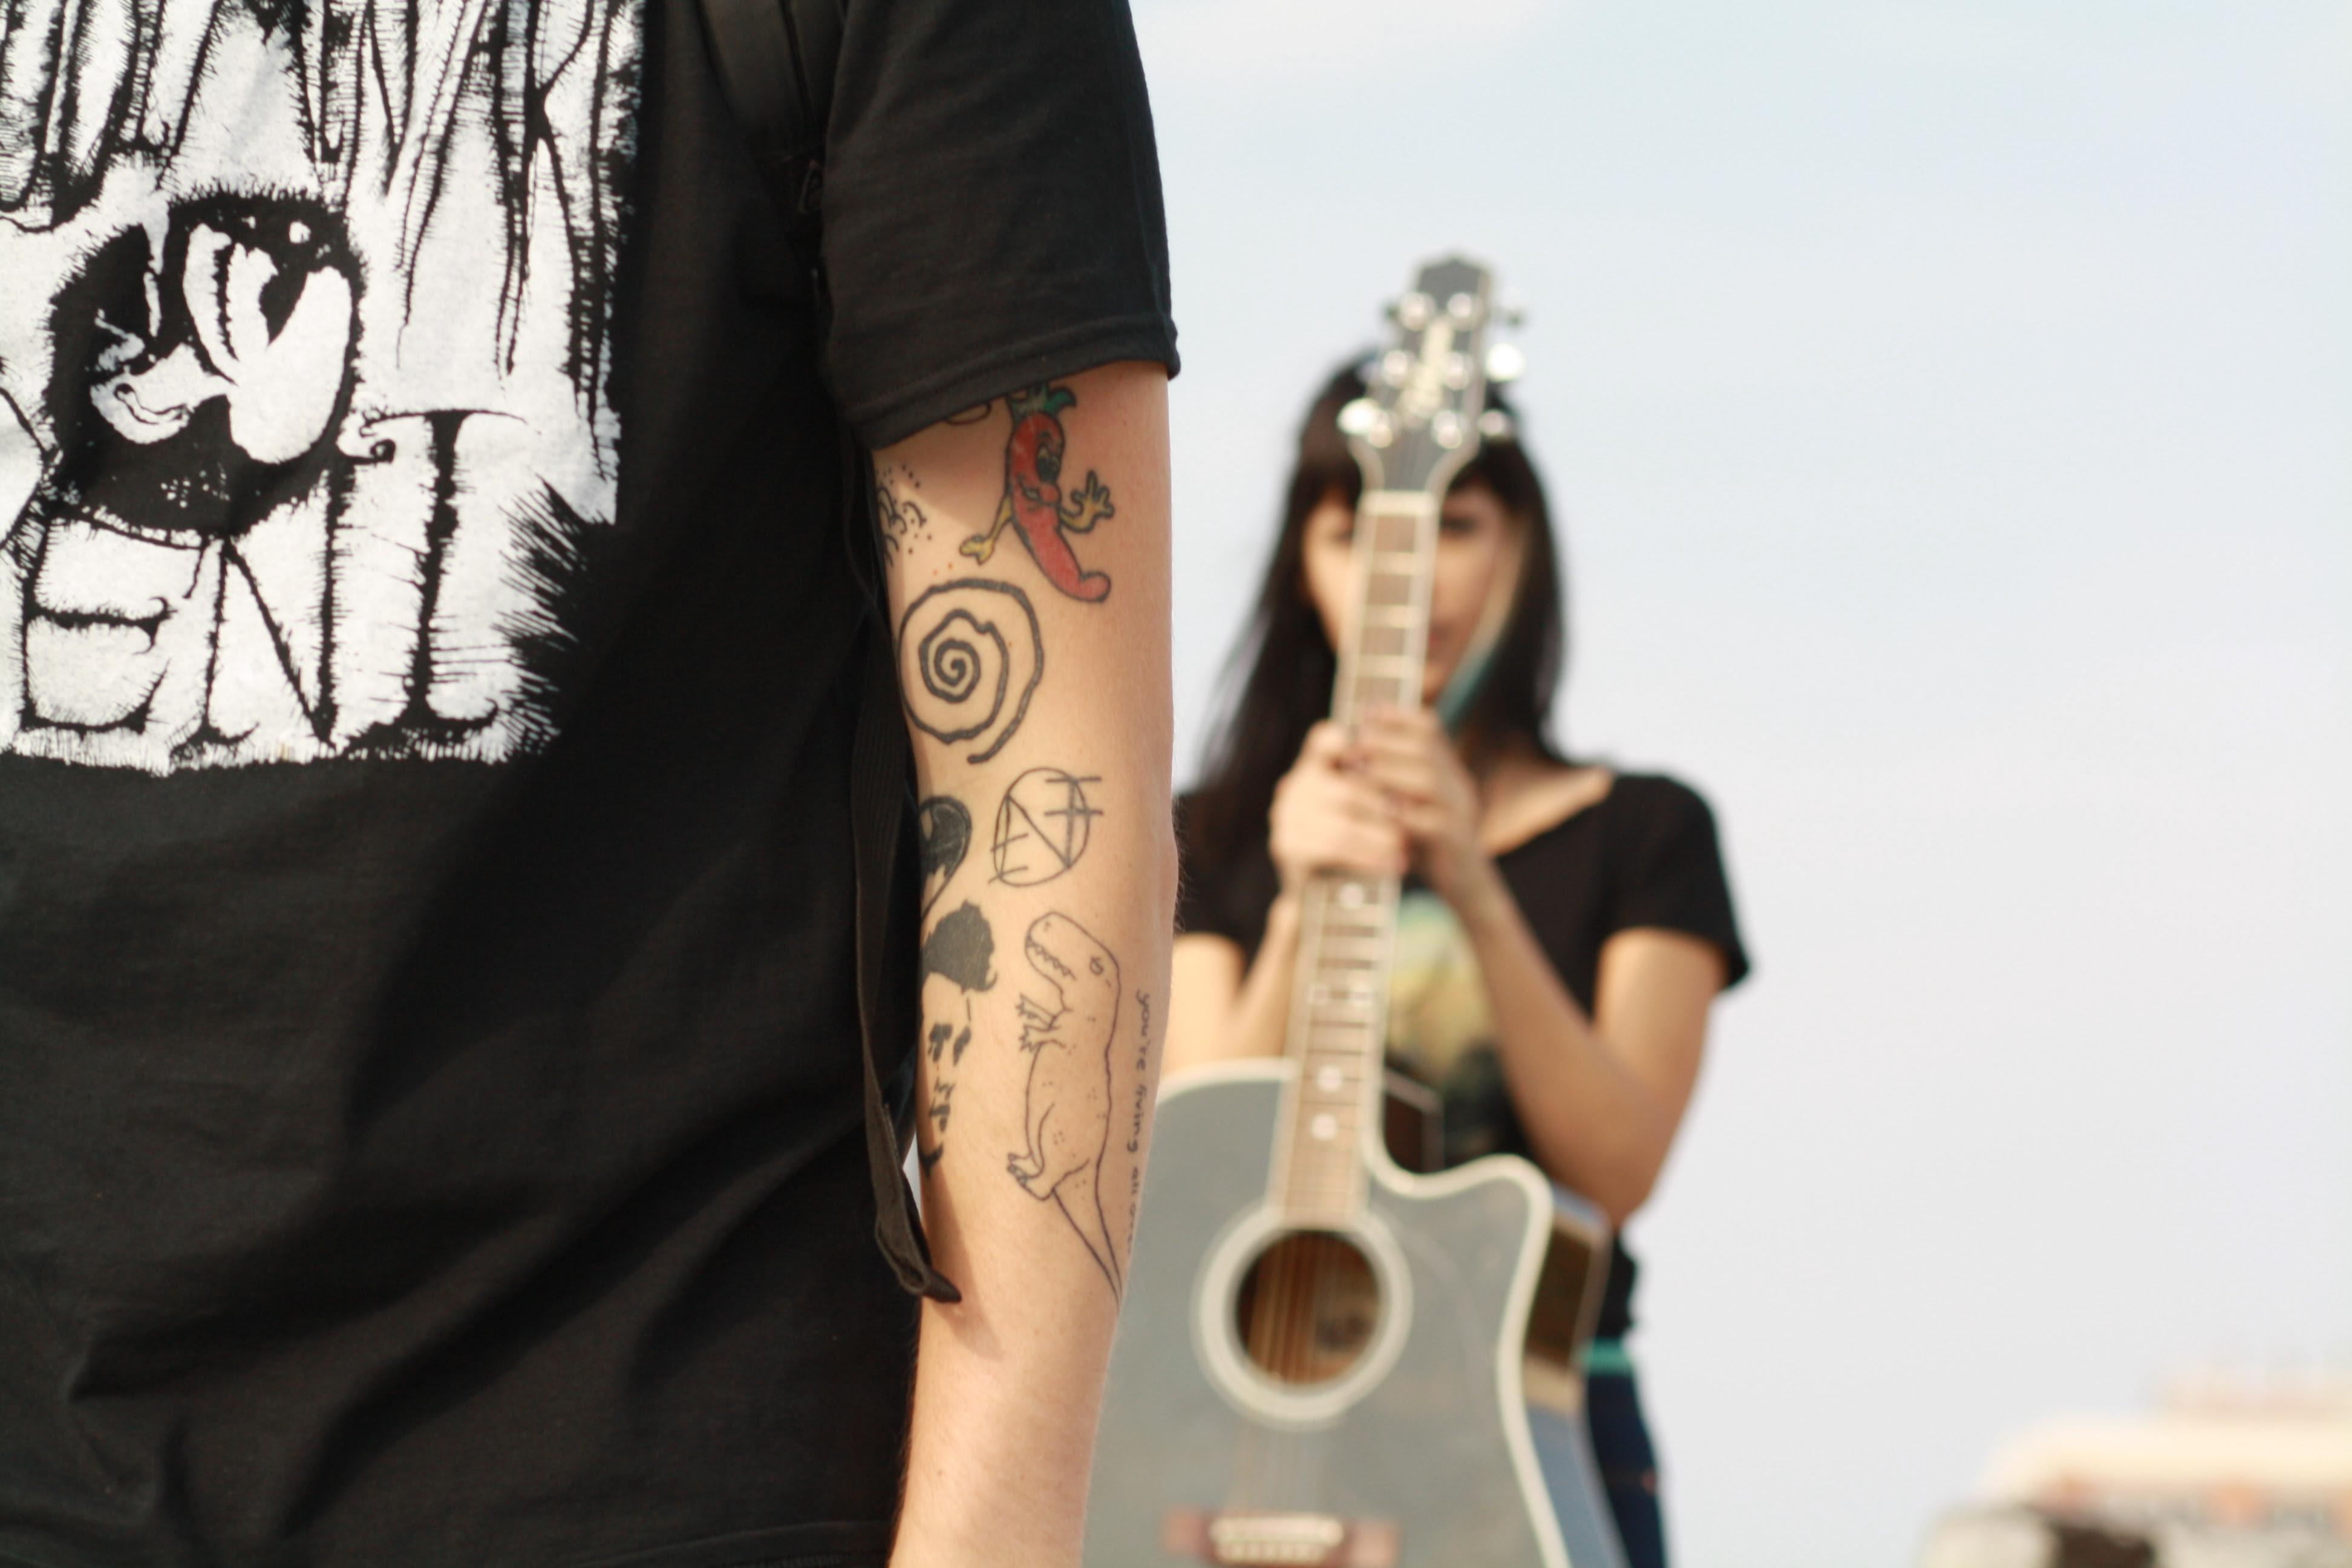 Release Of Morte Form | Alexandra Morte Leaves Whirr Forms Camera Shy Softconcretemag